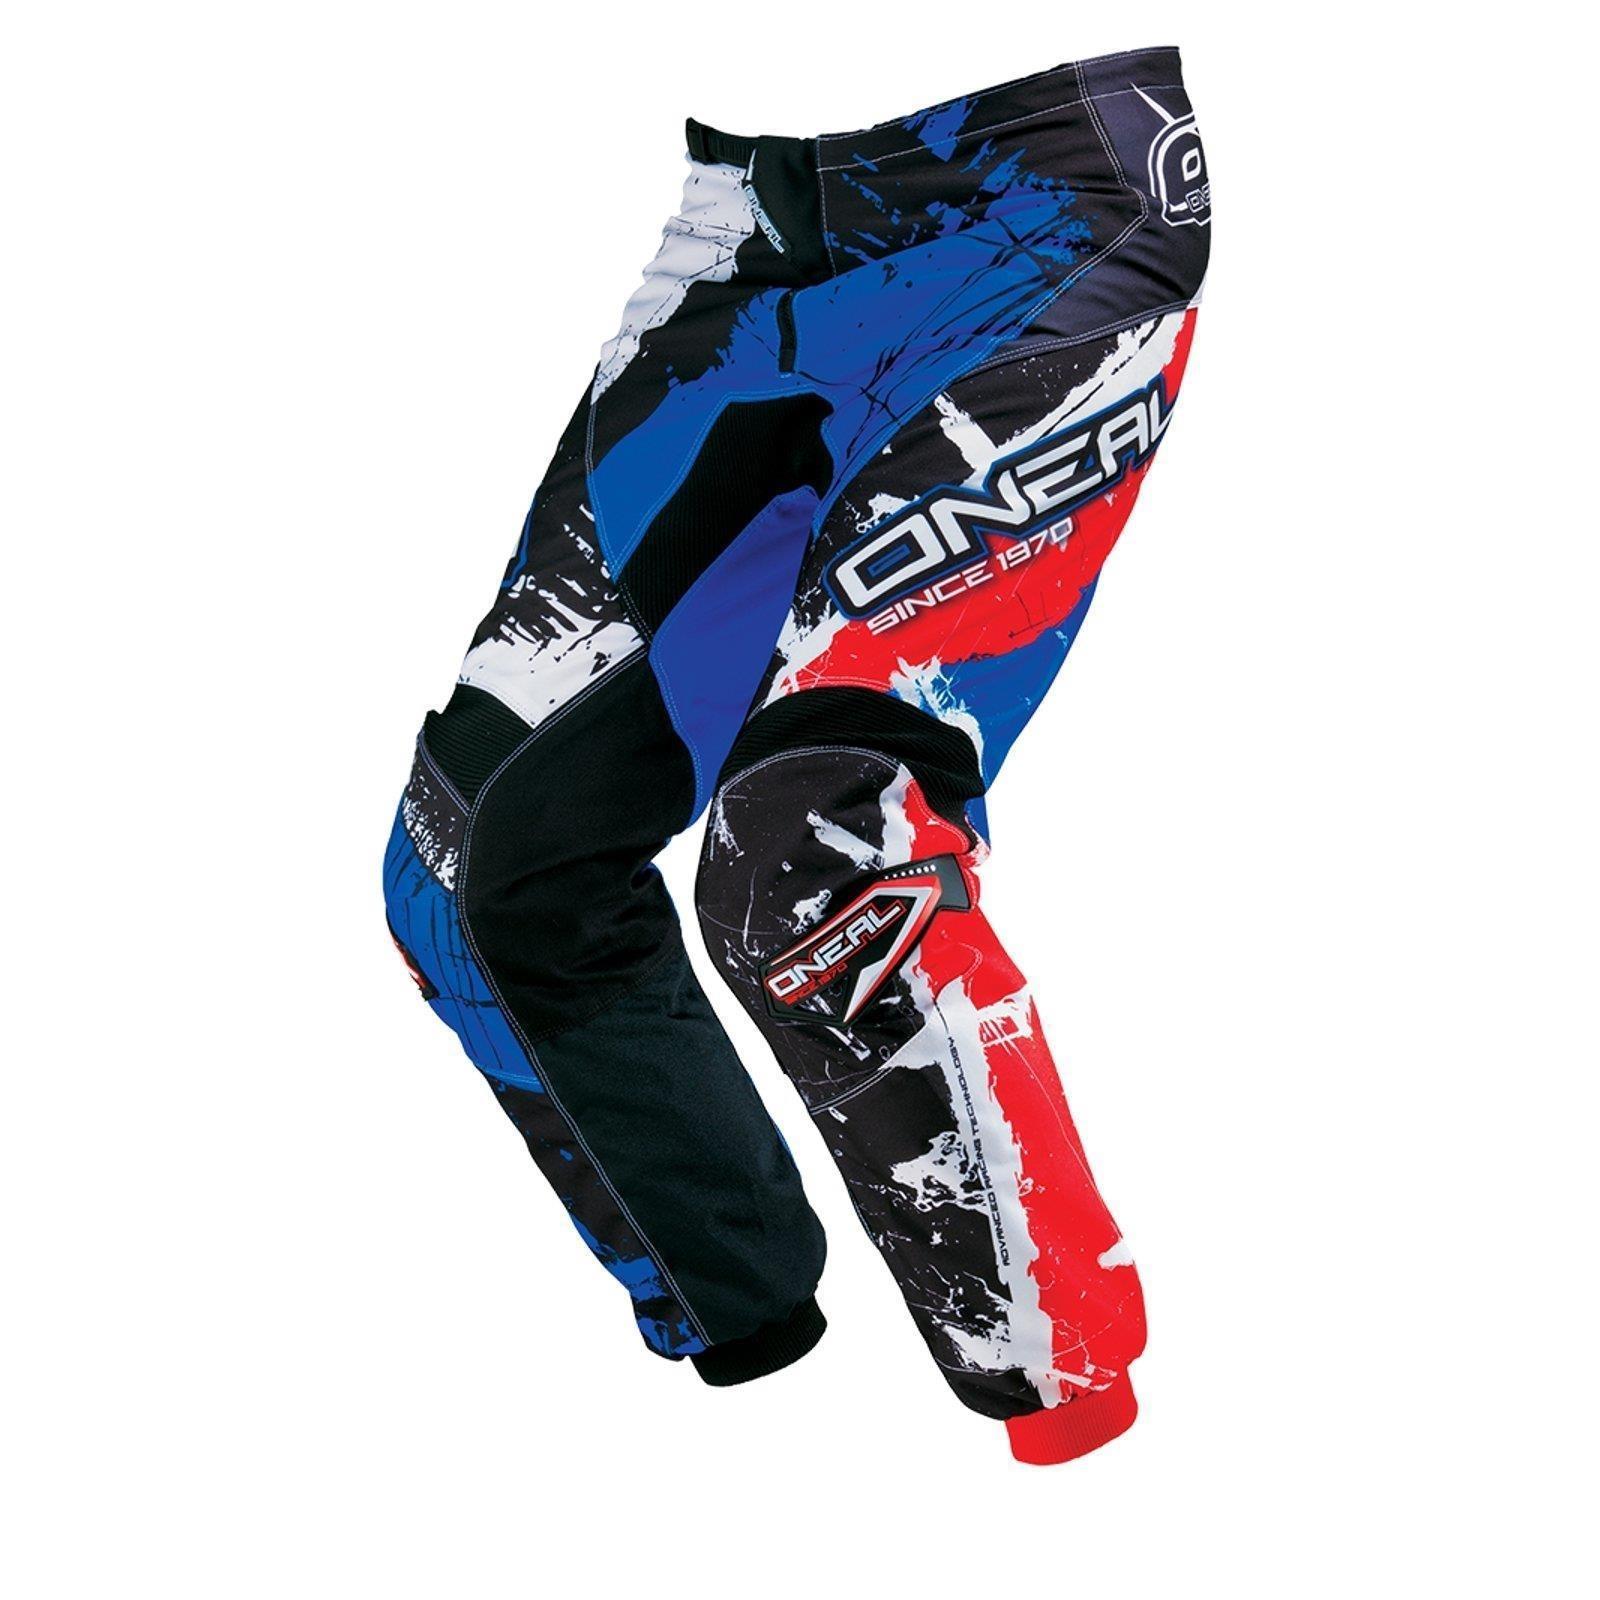 Oneal-elemento-ninos-MX-Jersey-pantalones-Shocker-Moto-Cross-Enduro-Mountainbike-MTB miniatura 15